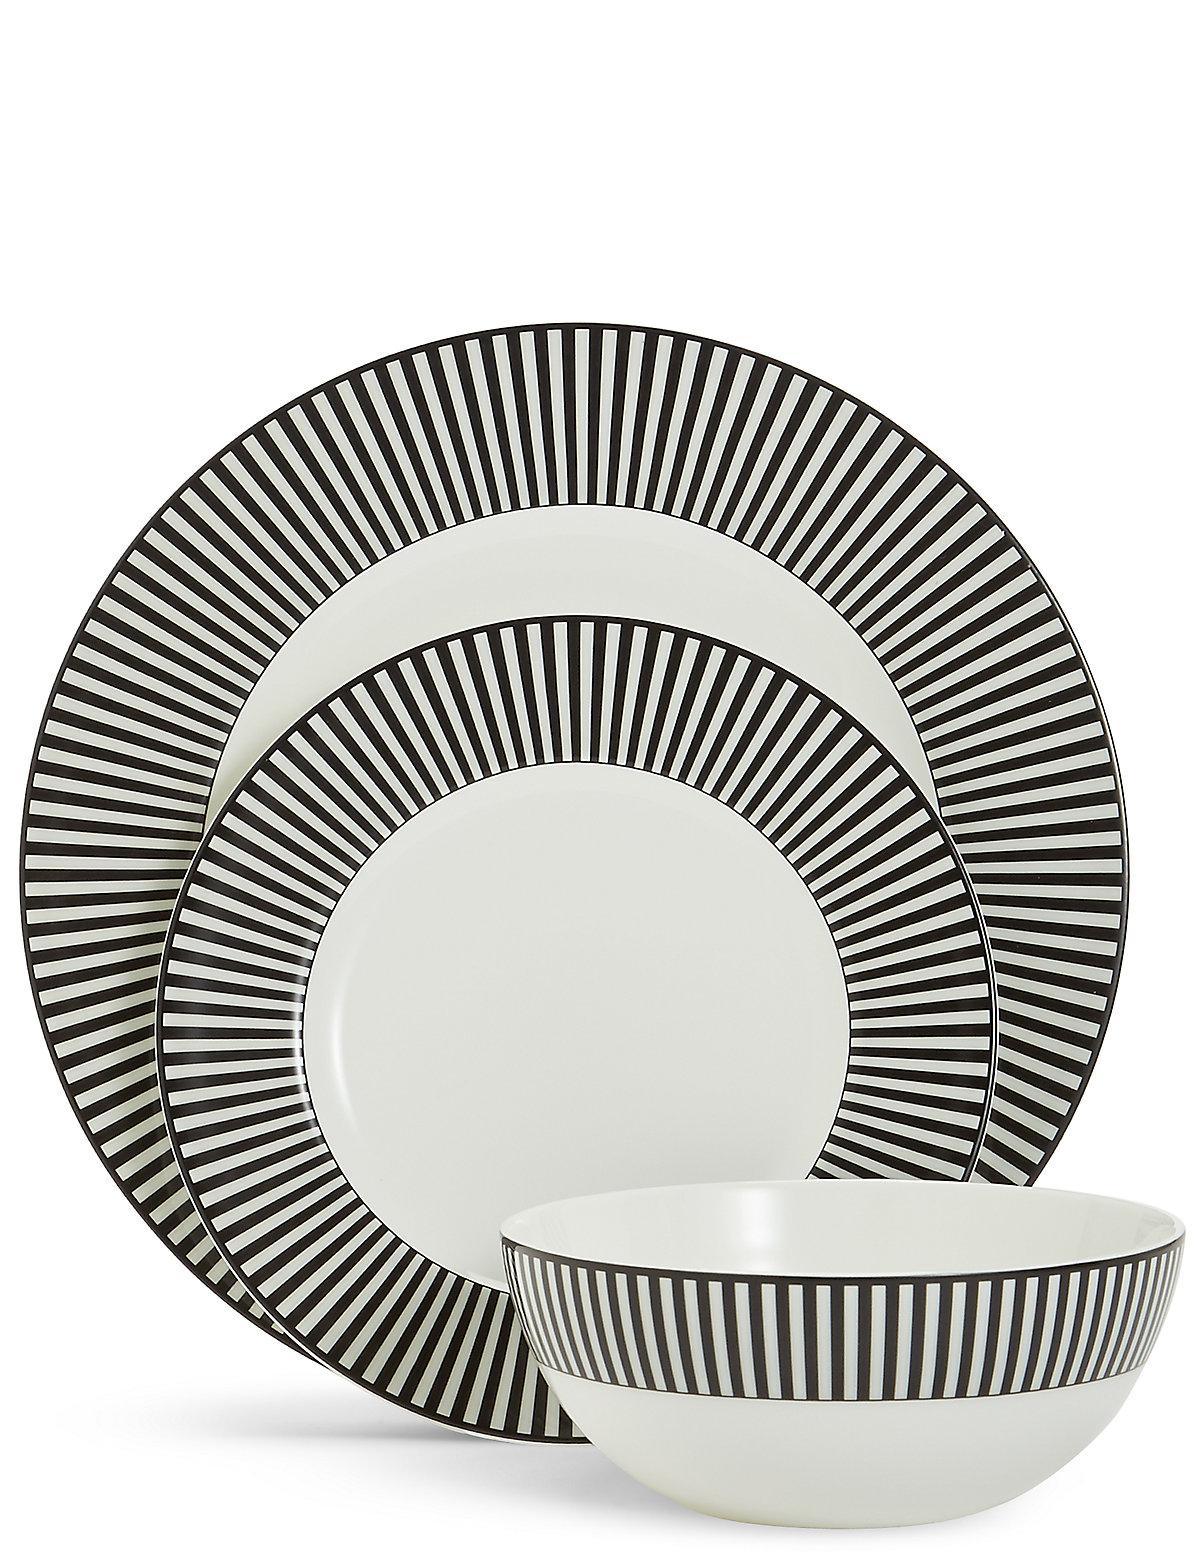 Image of 12 Piece Hampton Dinner Set